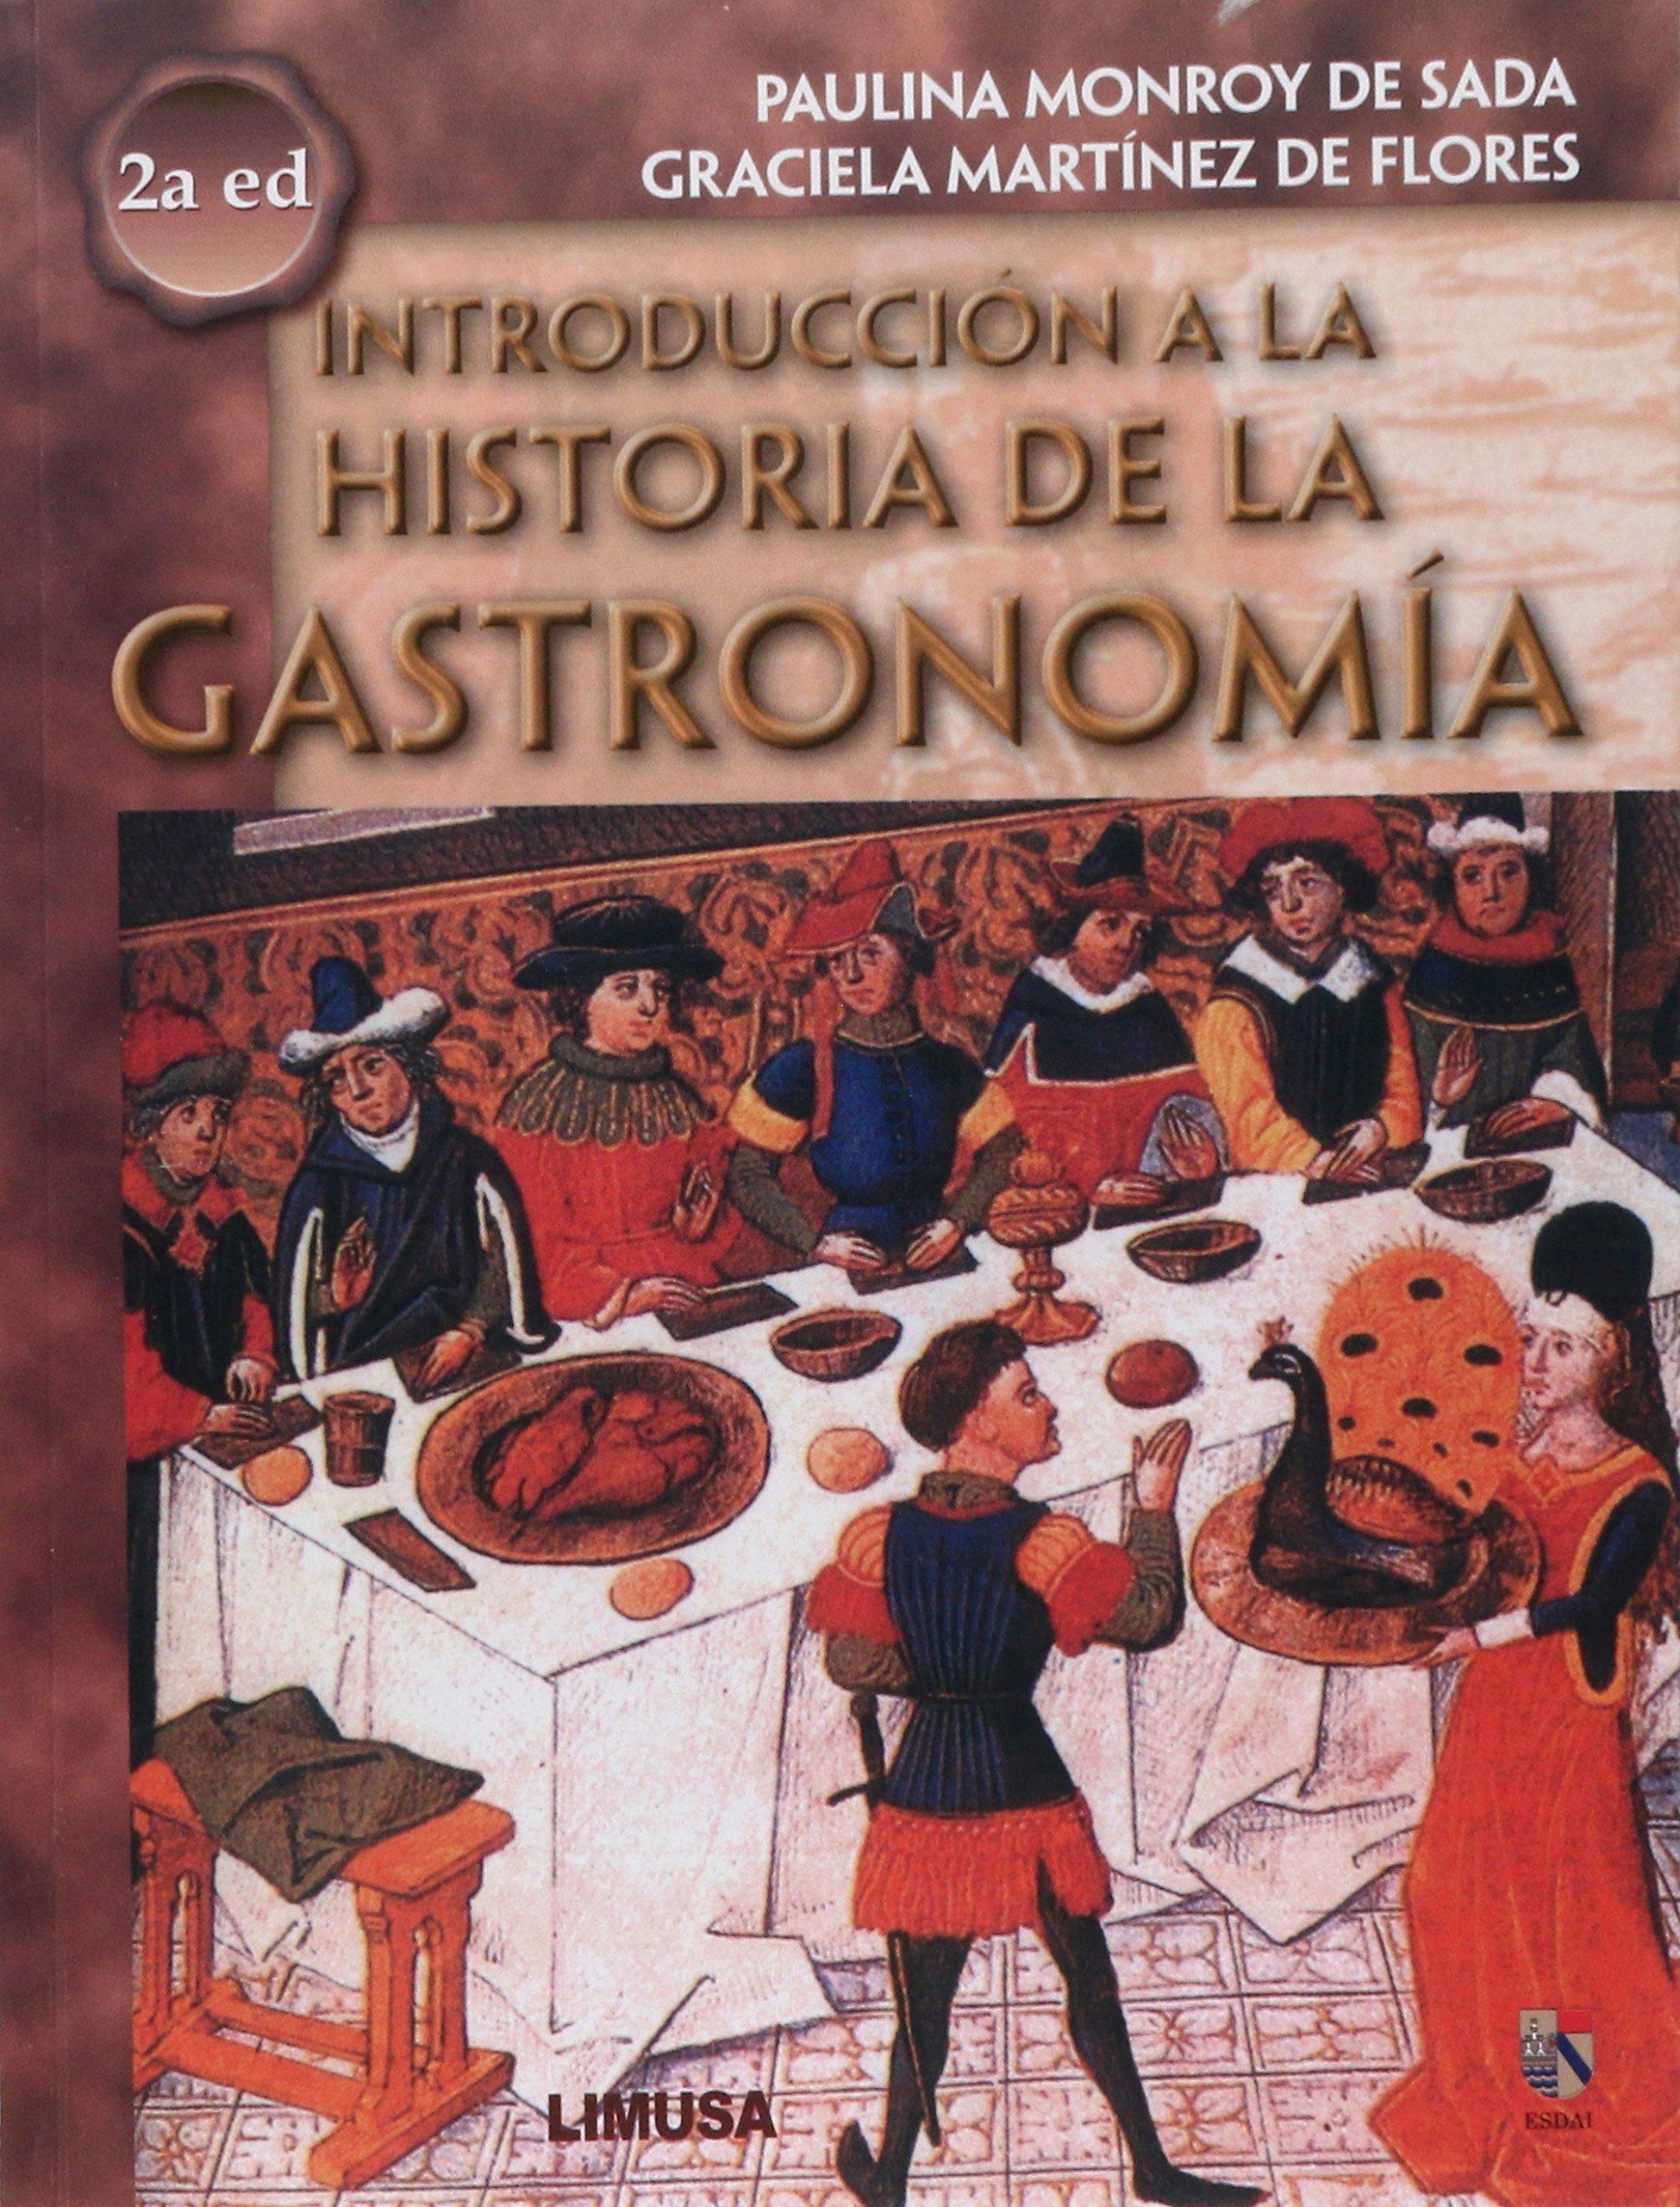 Download Introduccion A La Historia De La Gastronomia/ Introduction To The Gastronomy History (Spanish Edition) ebook